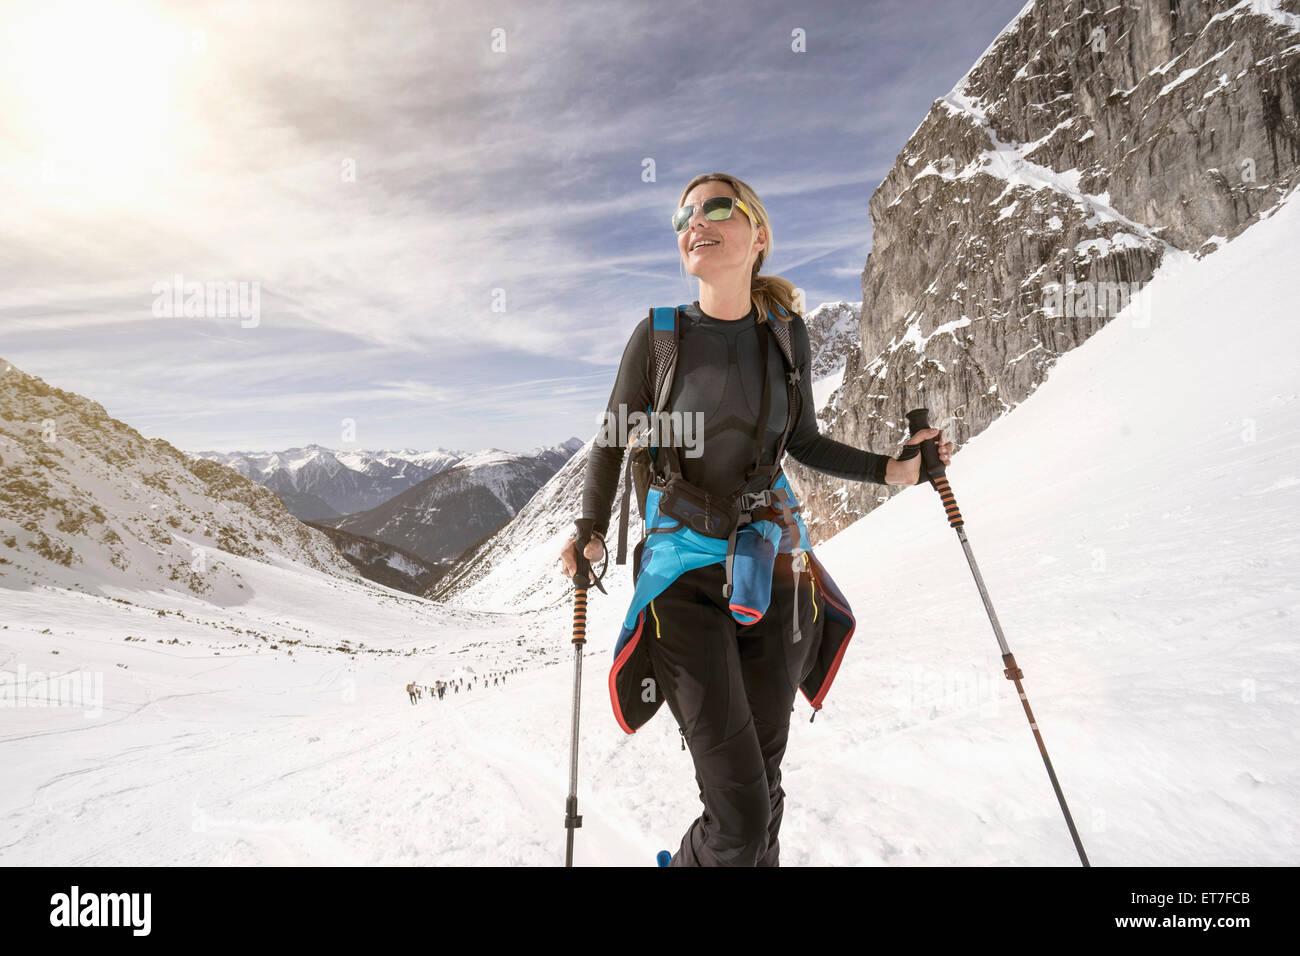 Young woman skiing, Bavaria, Germany - Stock Image